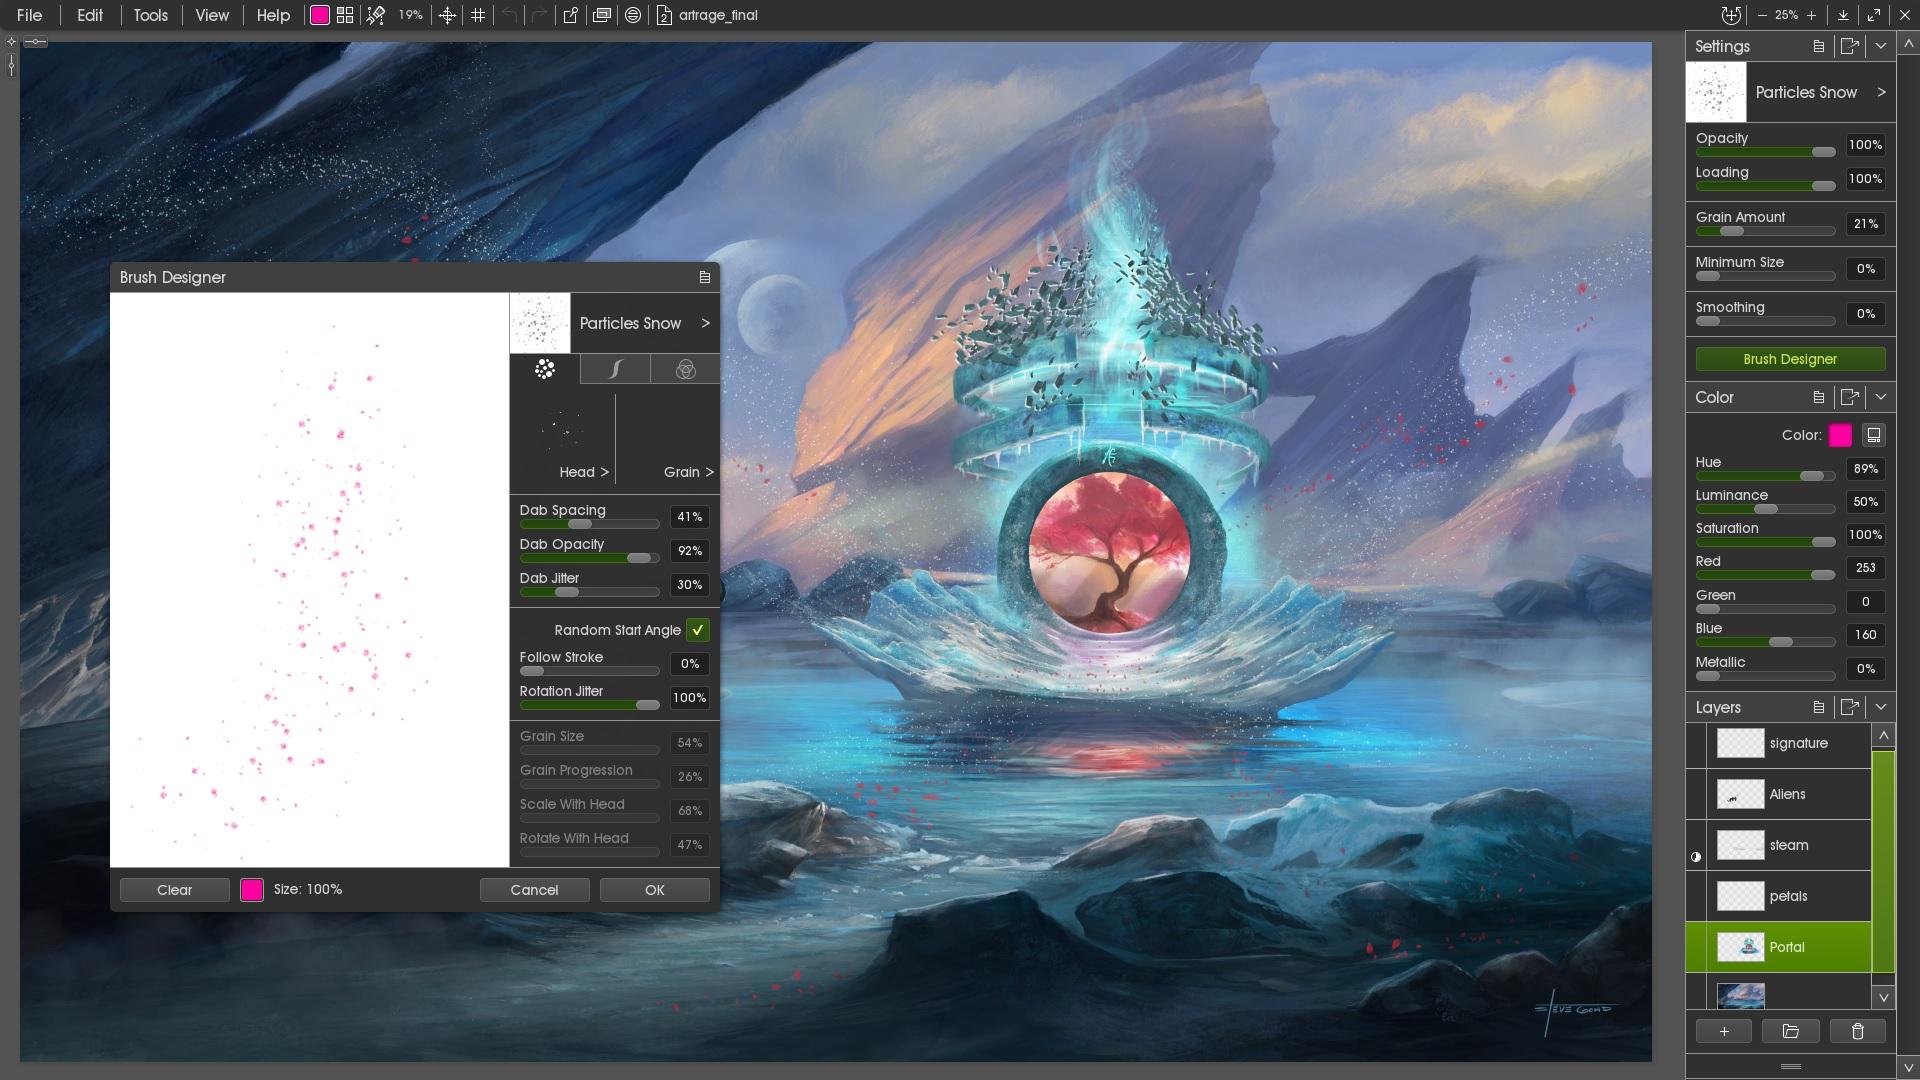 ArtRage Demo - Professional Digital Editing Features